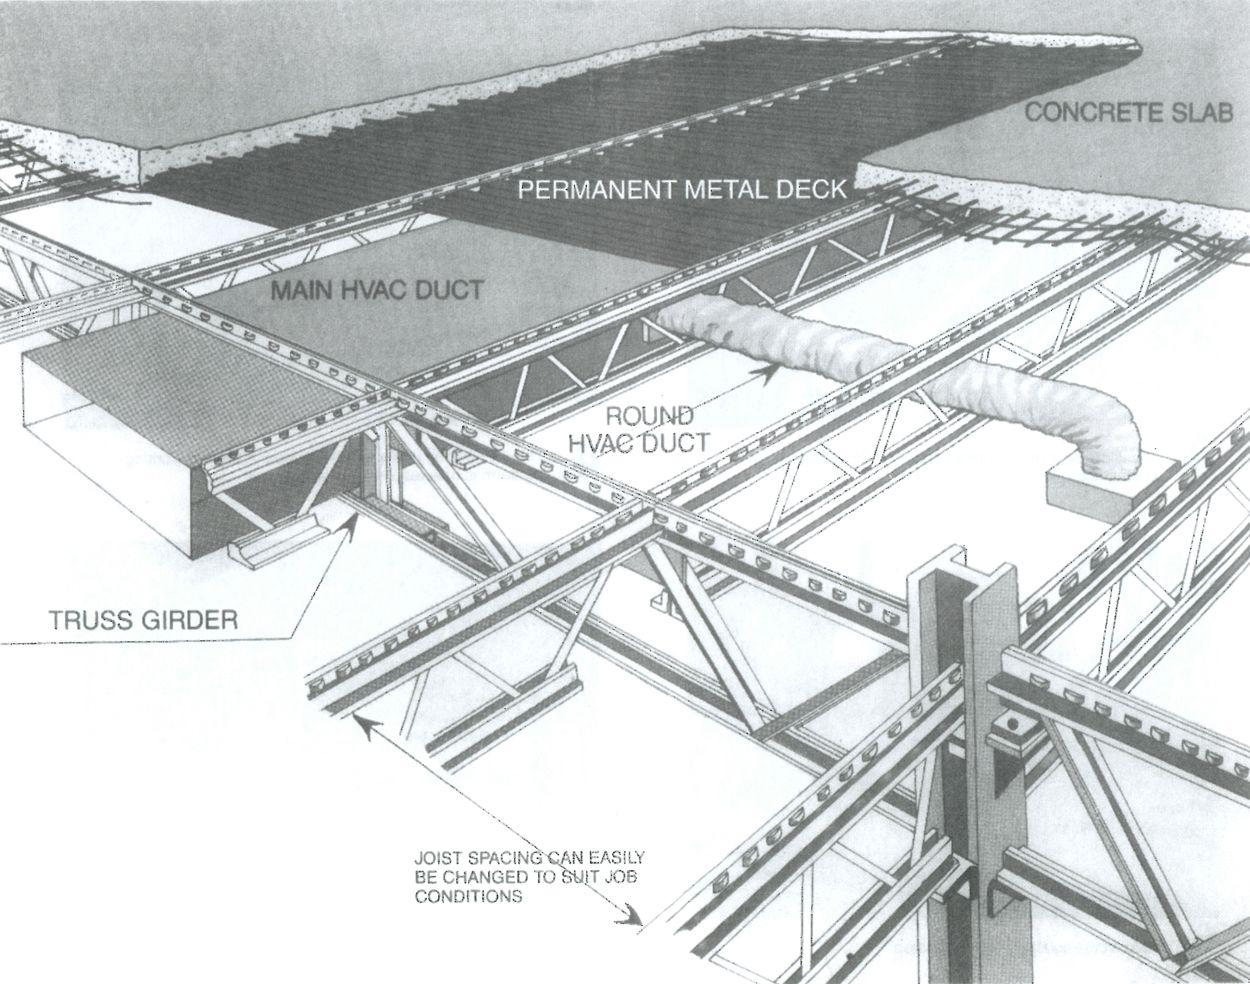 Steel Girder Truss Framing Construction Steel Structure Buildings Steel Frame Construction